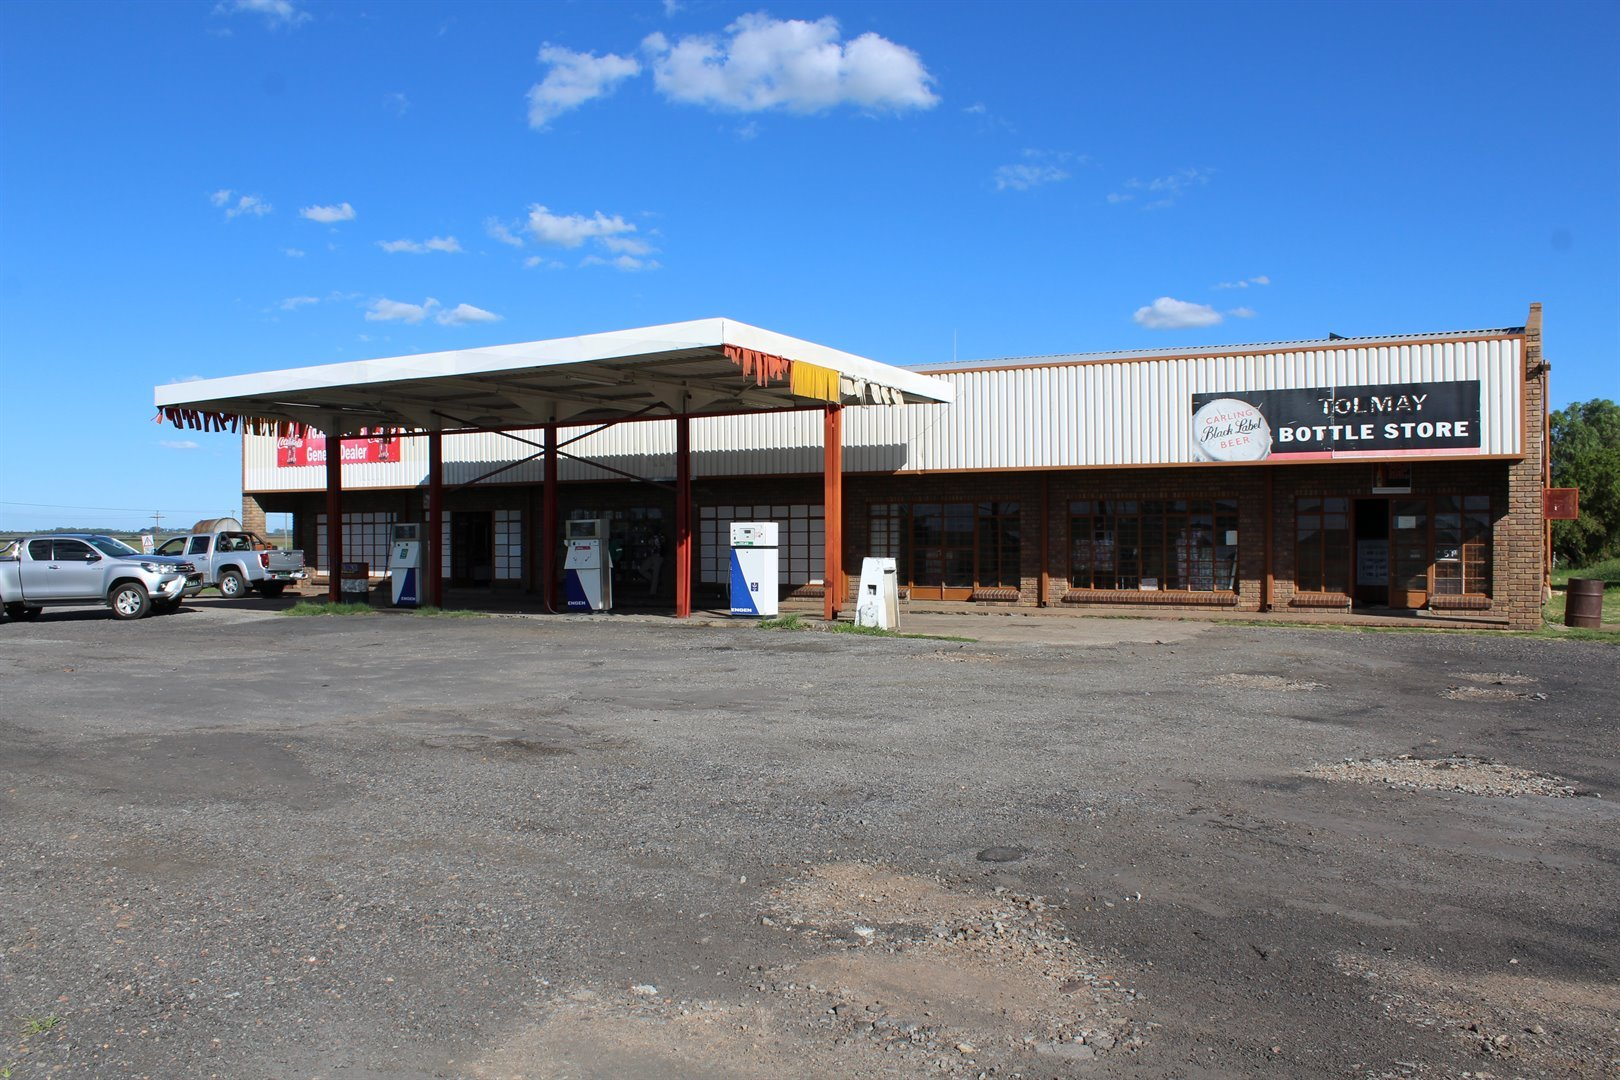 Potchefstroom, Potchefstroom Property  | Houses For Sale Potchefstroom, Potchefstroom, Commercial  property for sale Price:4,500,000